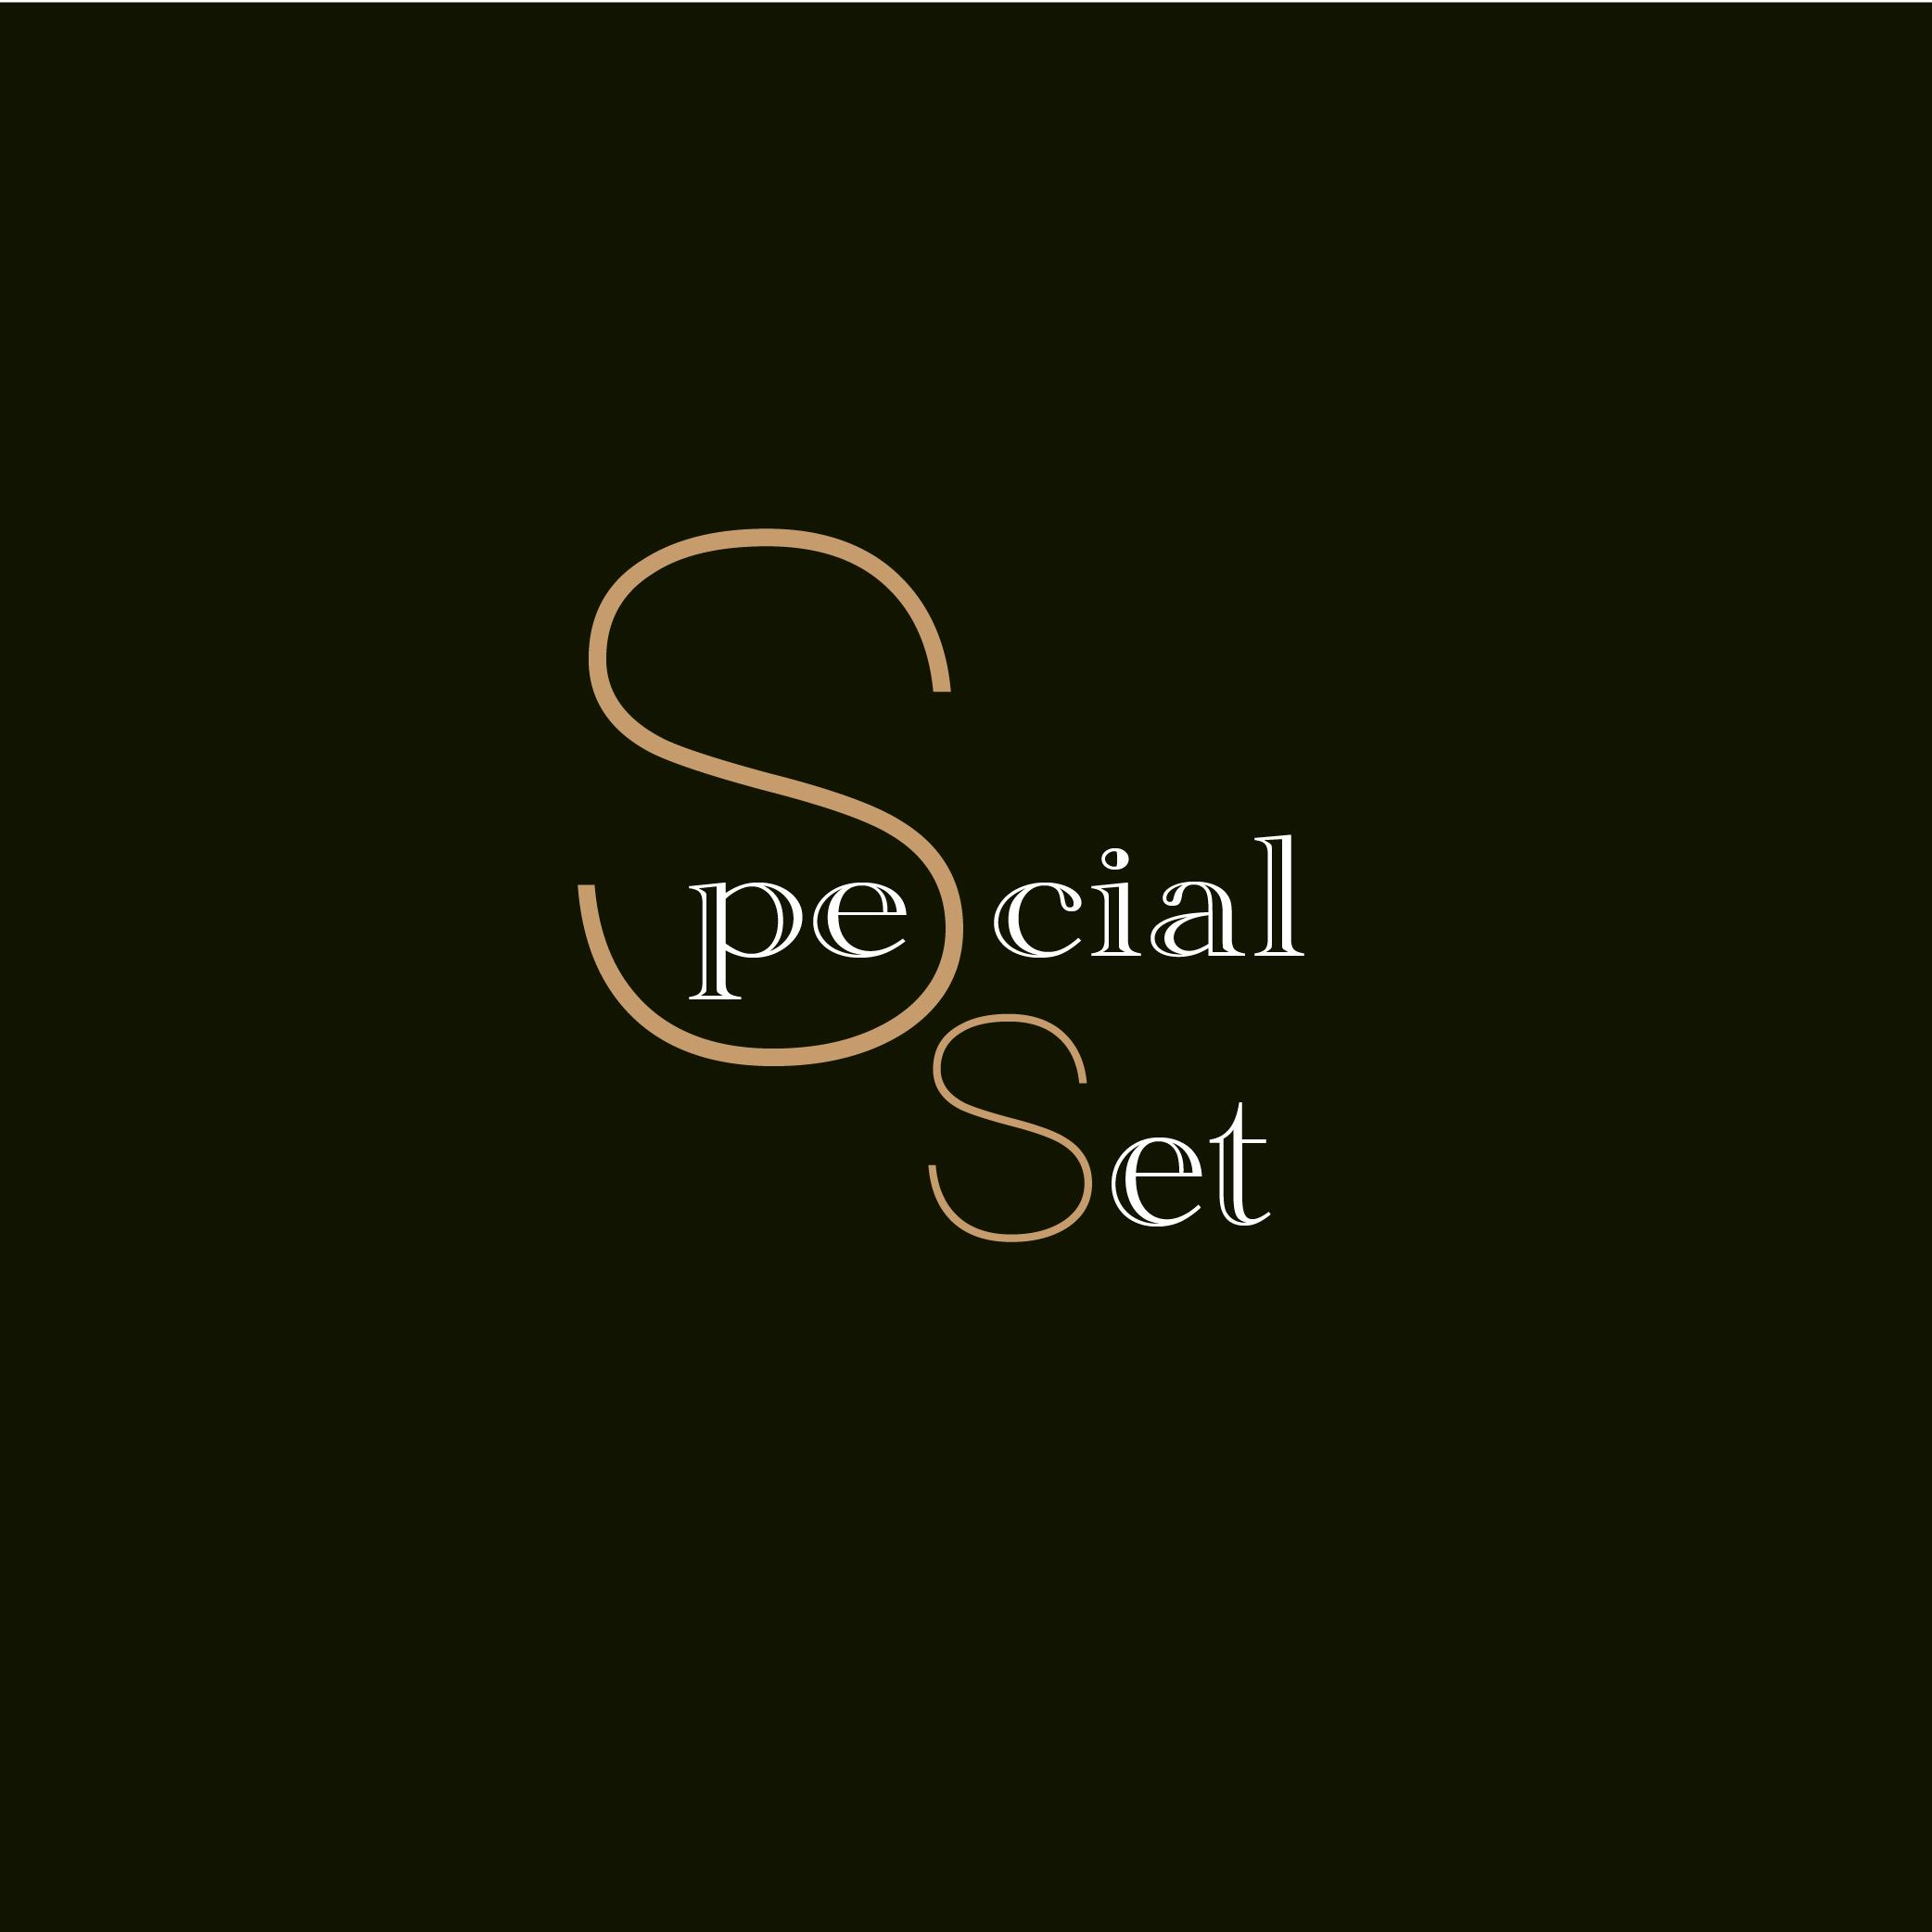 Special Set Menu